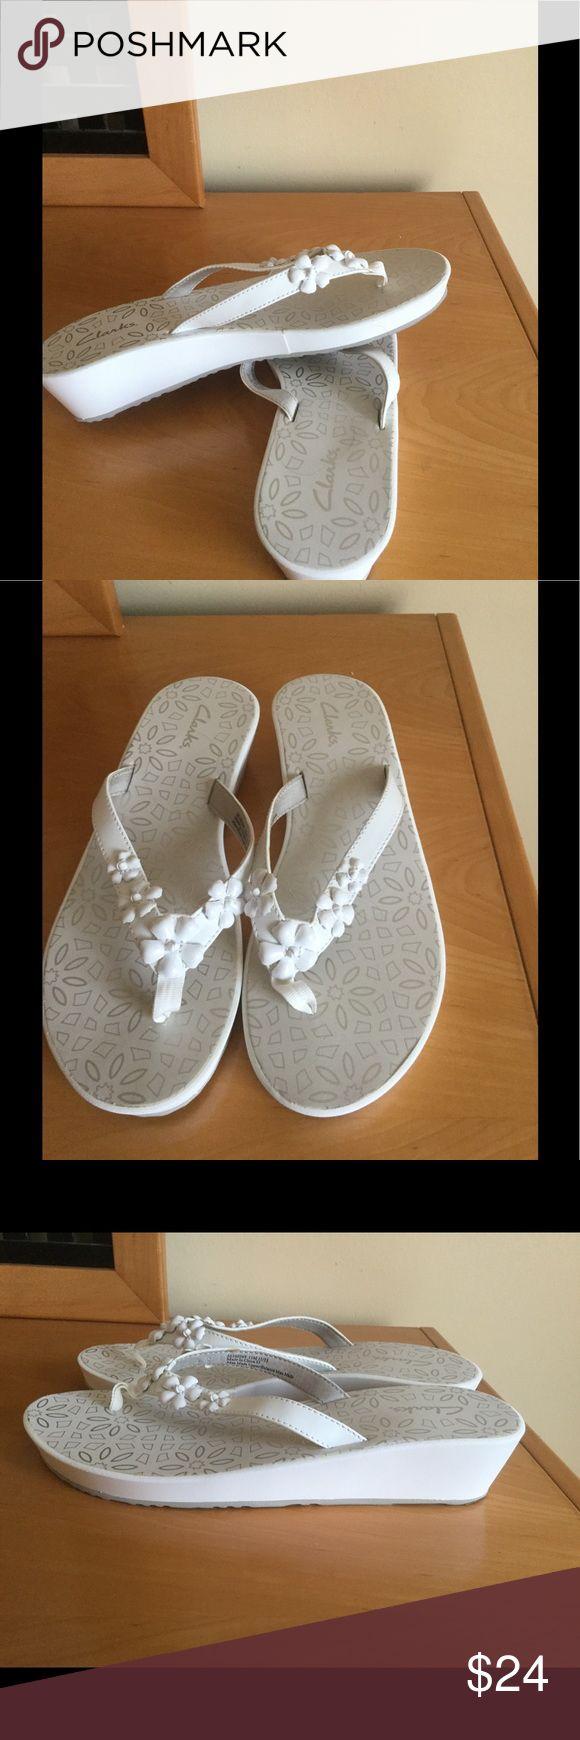 New Clarks white wedge flip flops New Clarks white flip flops . Man made upper .No box ❌Price firm Clarks Shoes Sandals